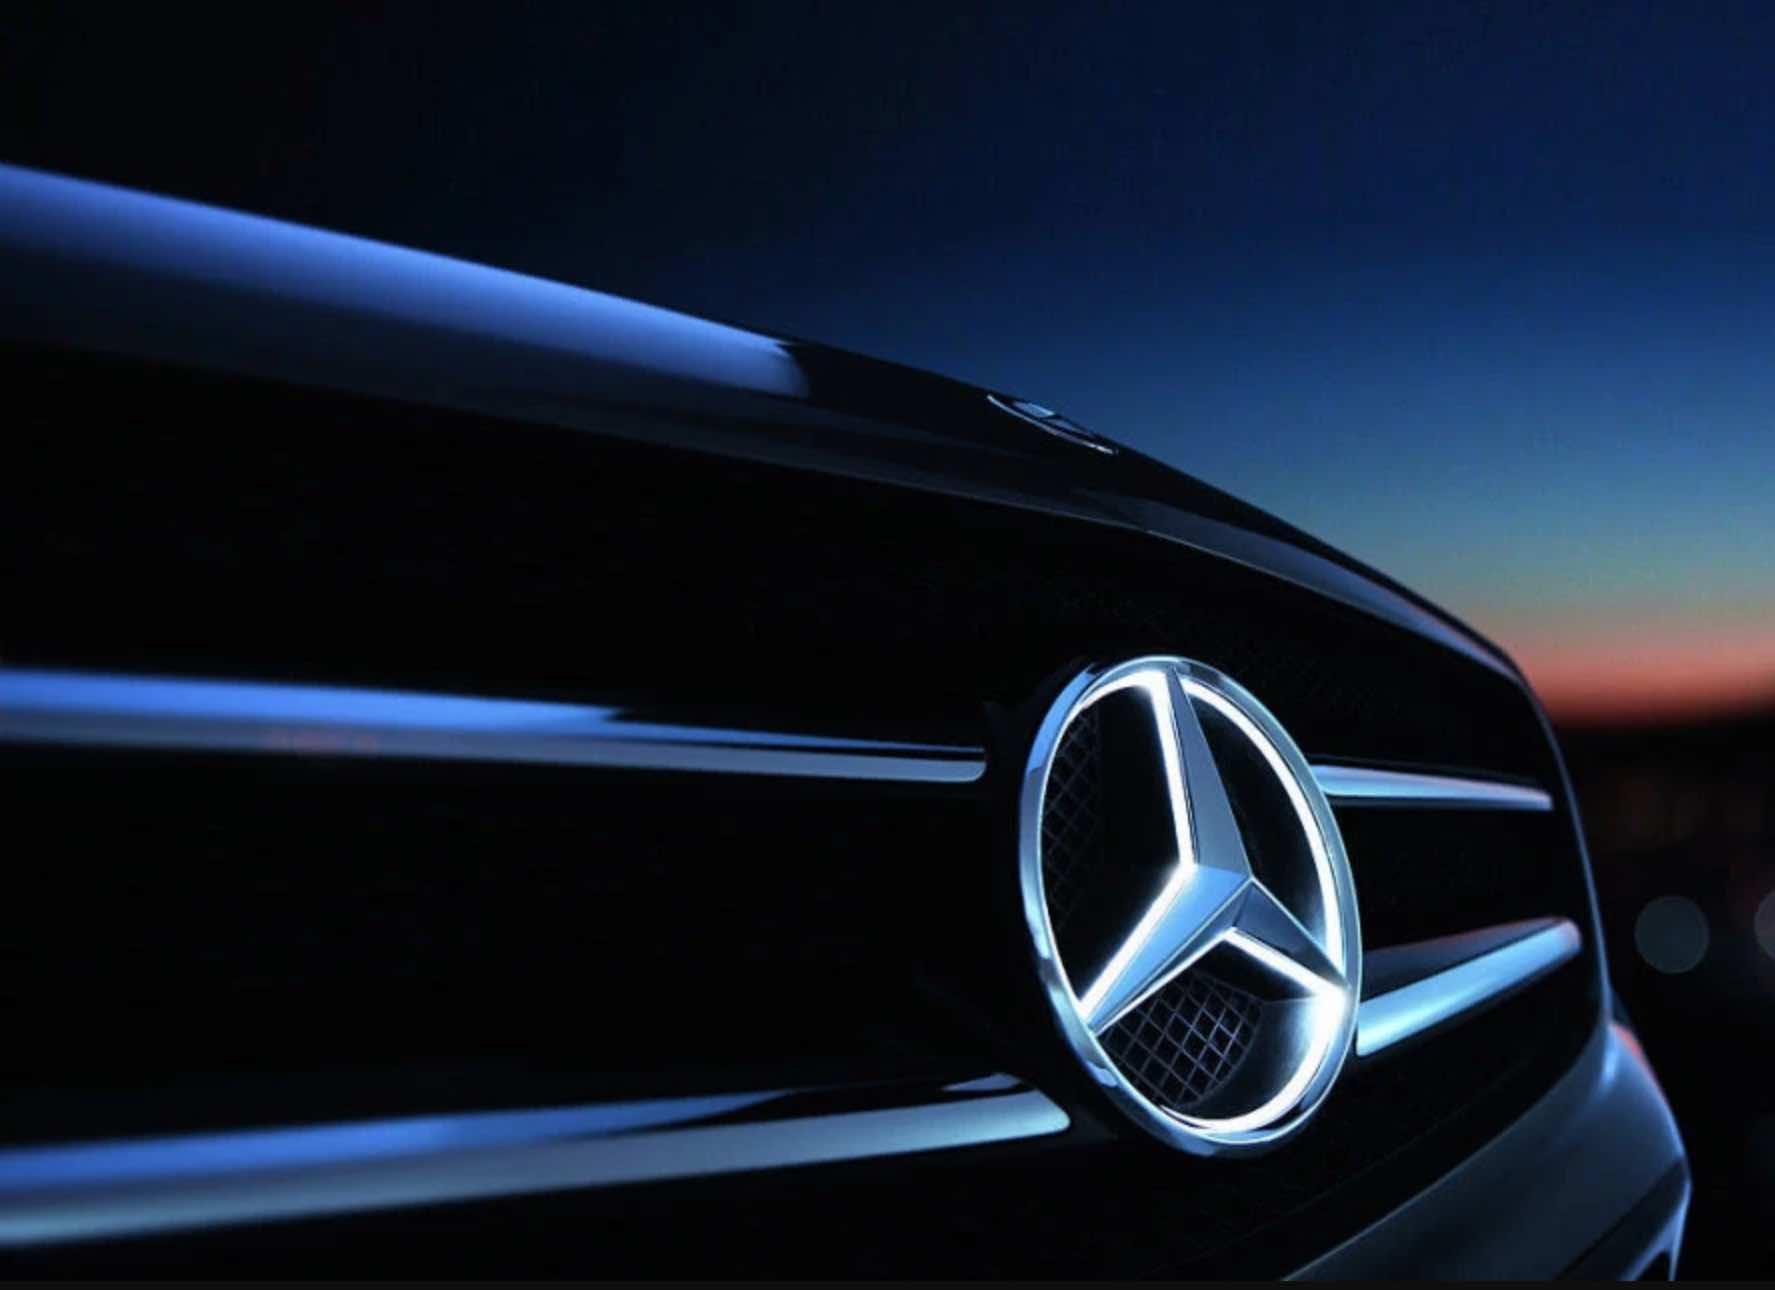 mercedes-benz & autonomous driving